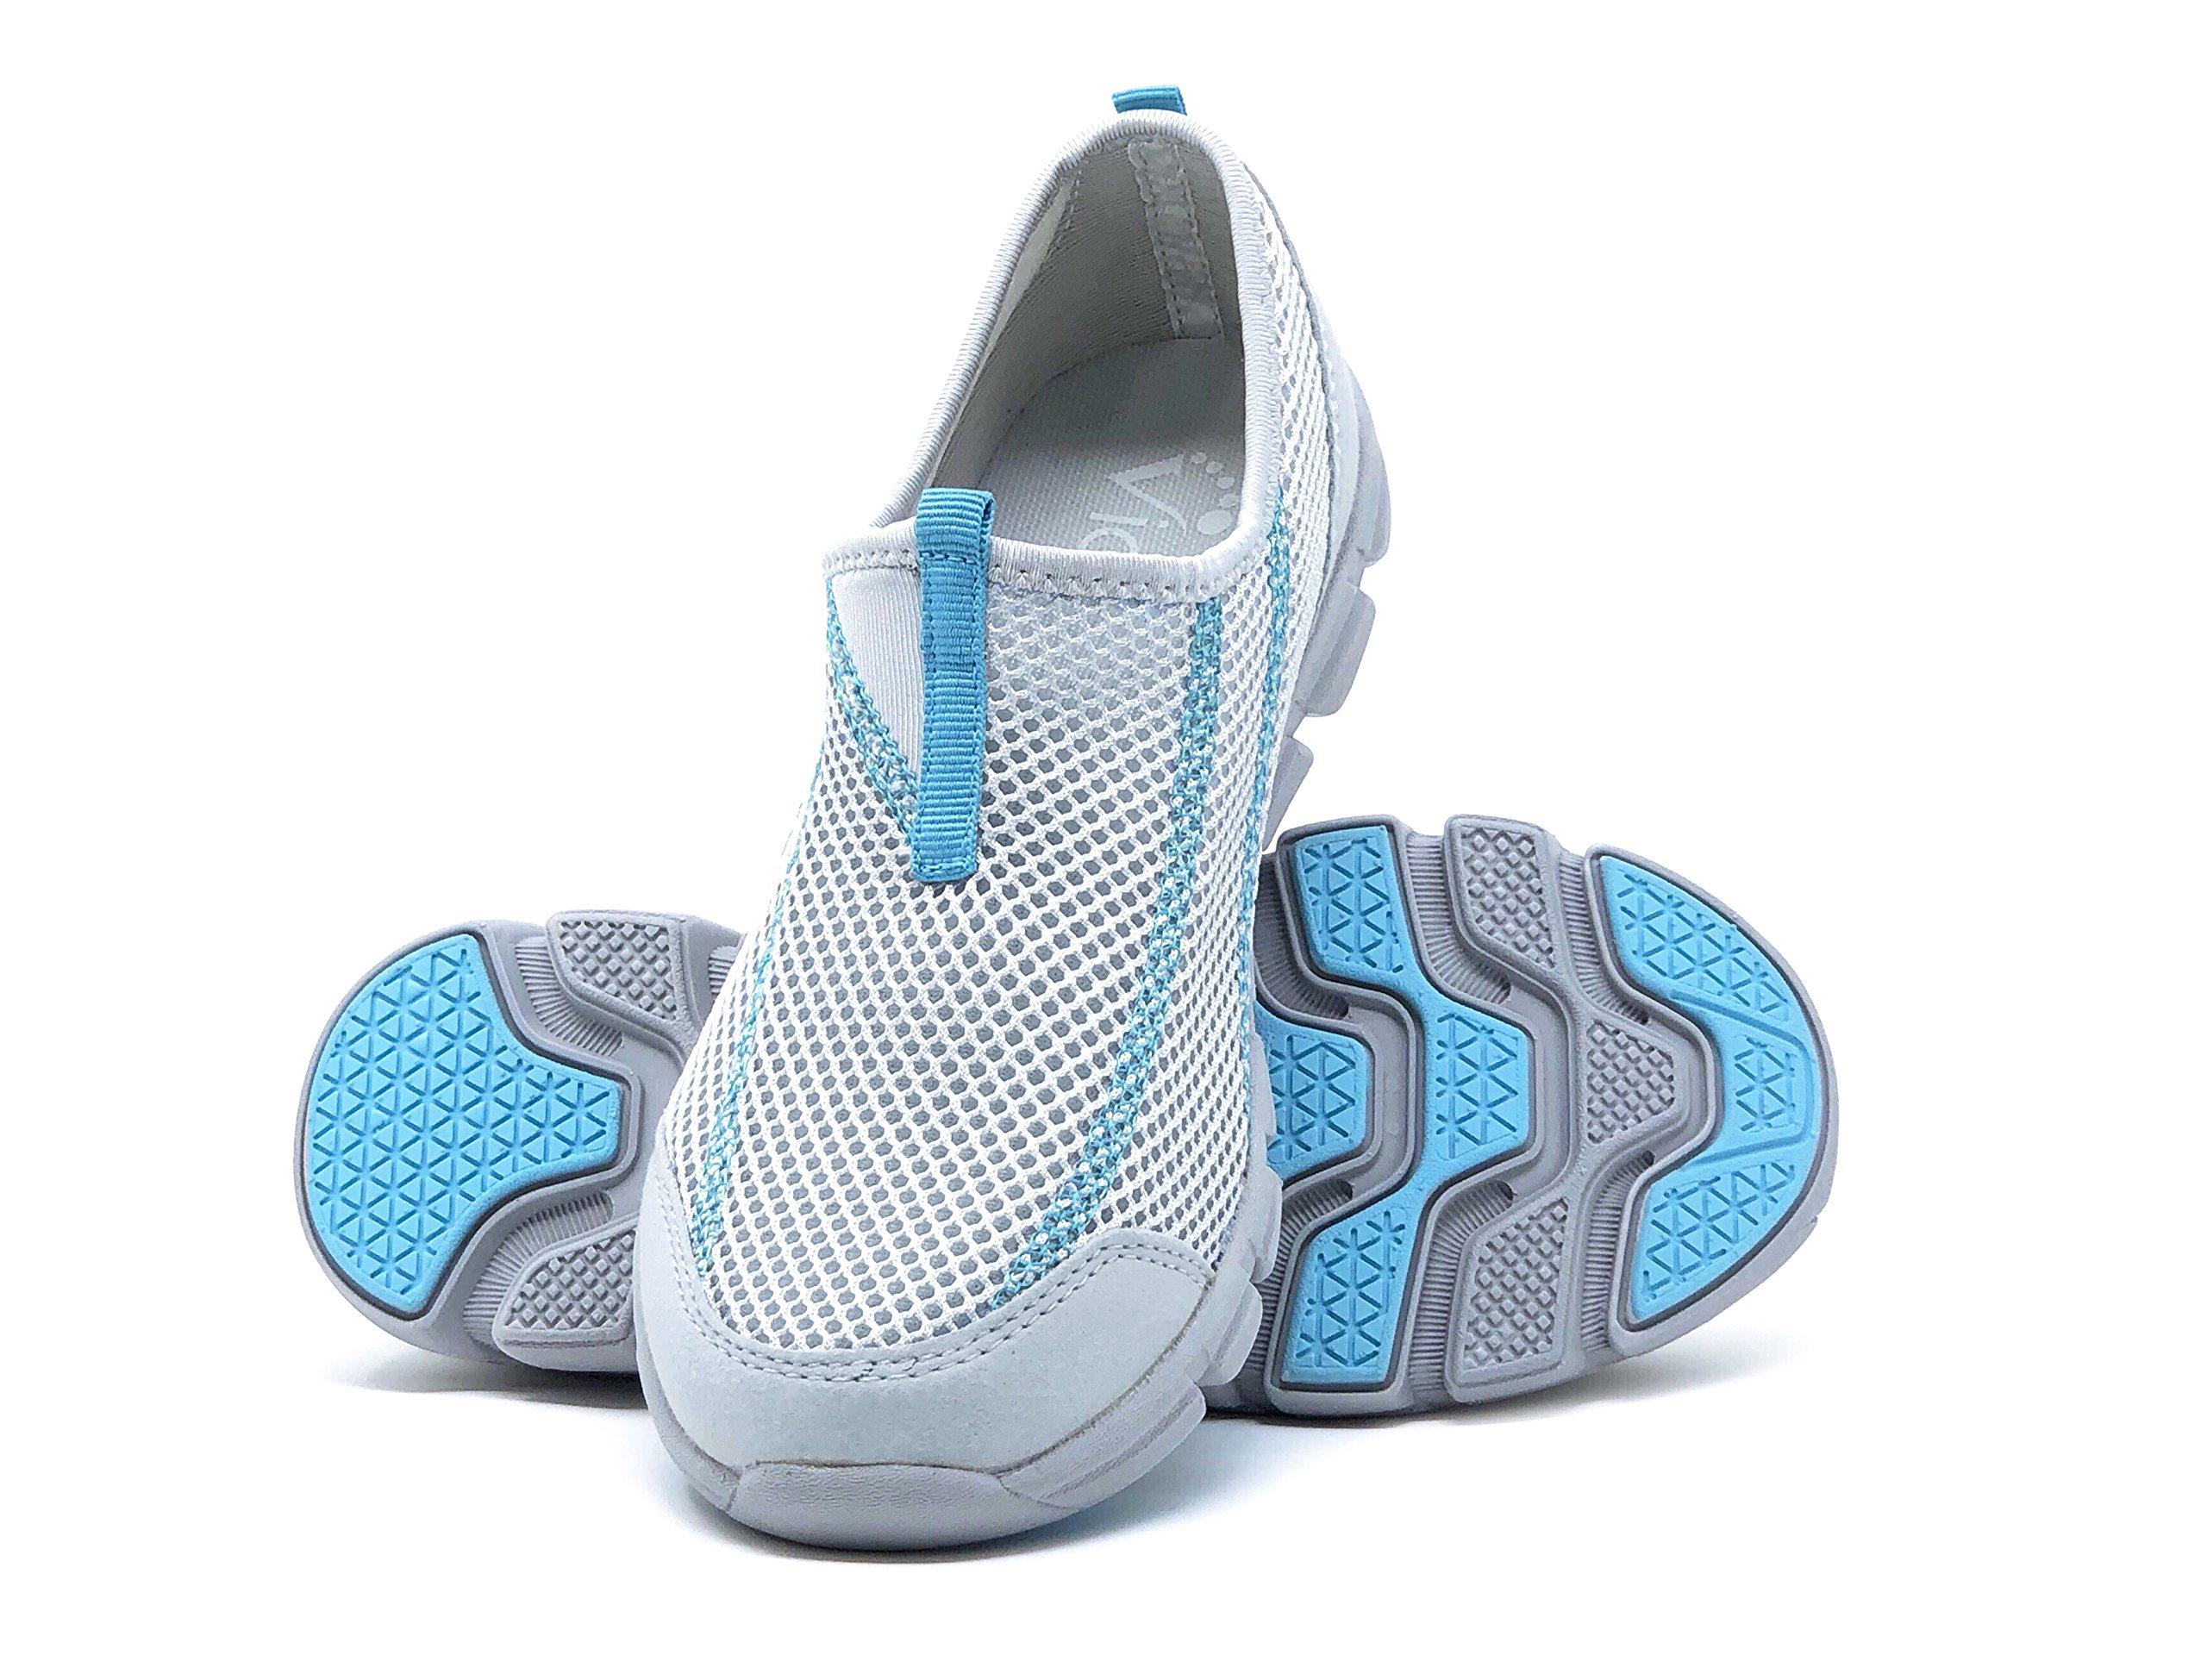 Viakix Water Shoes for Women - Ultra Comfort, Quality, Style - Swim, Pool, Aqua, Beach, Boat by Viakix